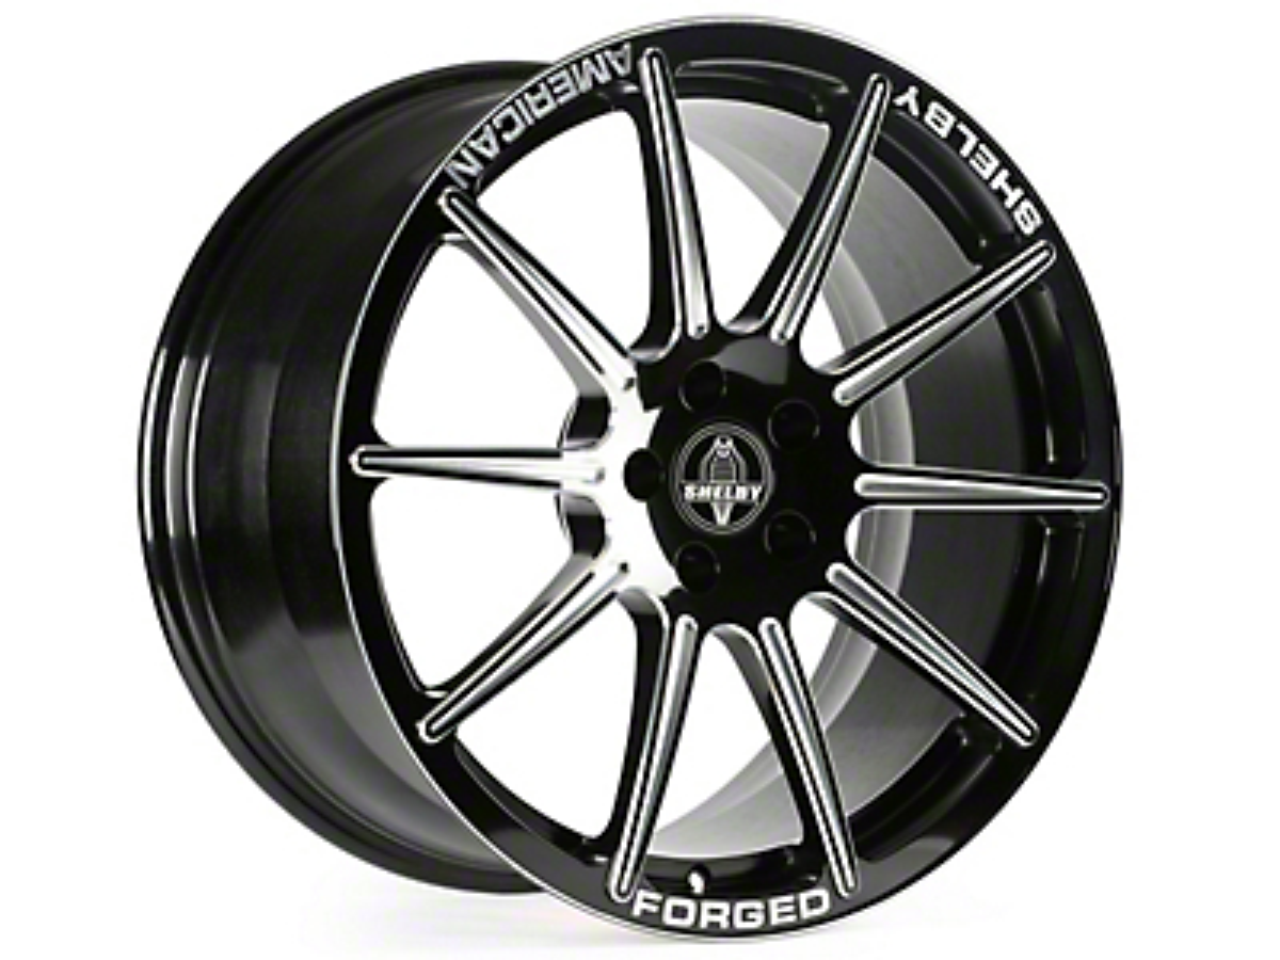 Shelby Venice Black Machined Wheel - 20x10.5 (05-14 All)